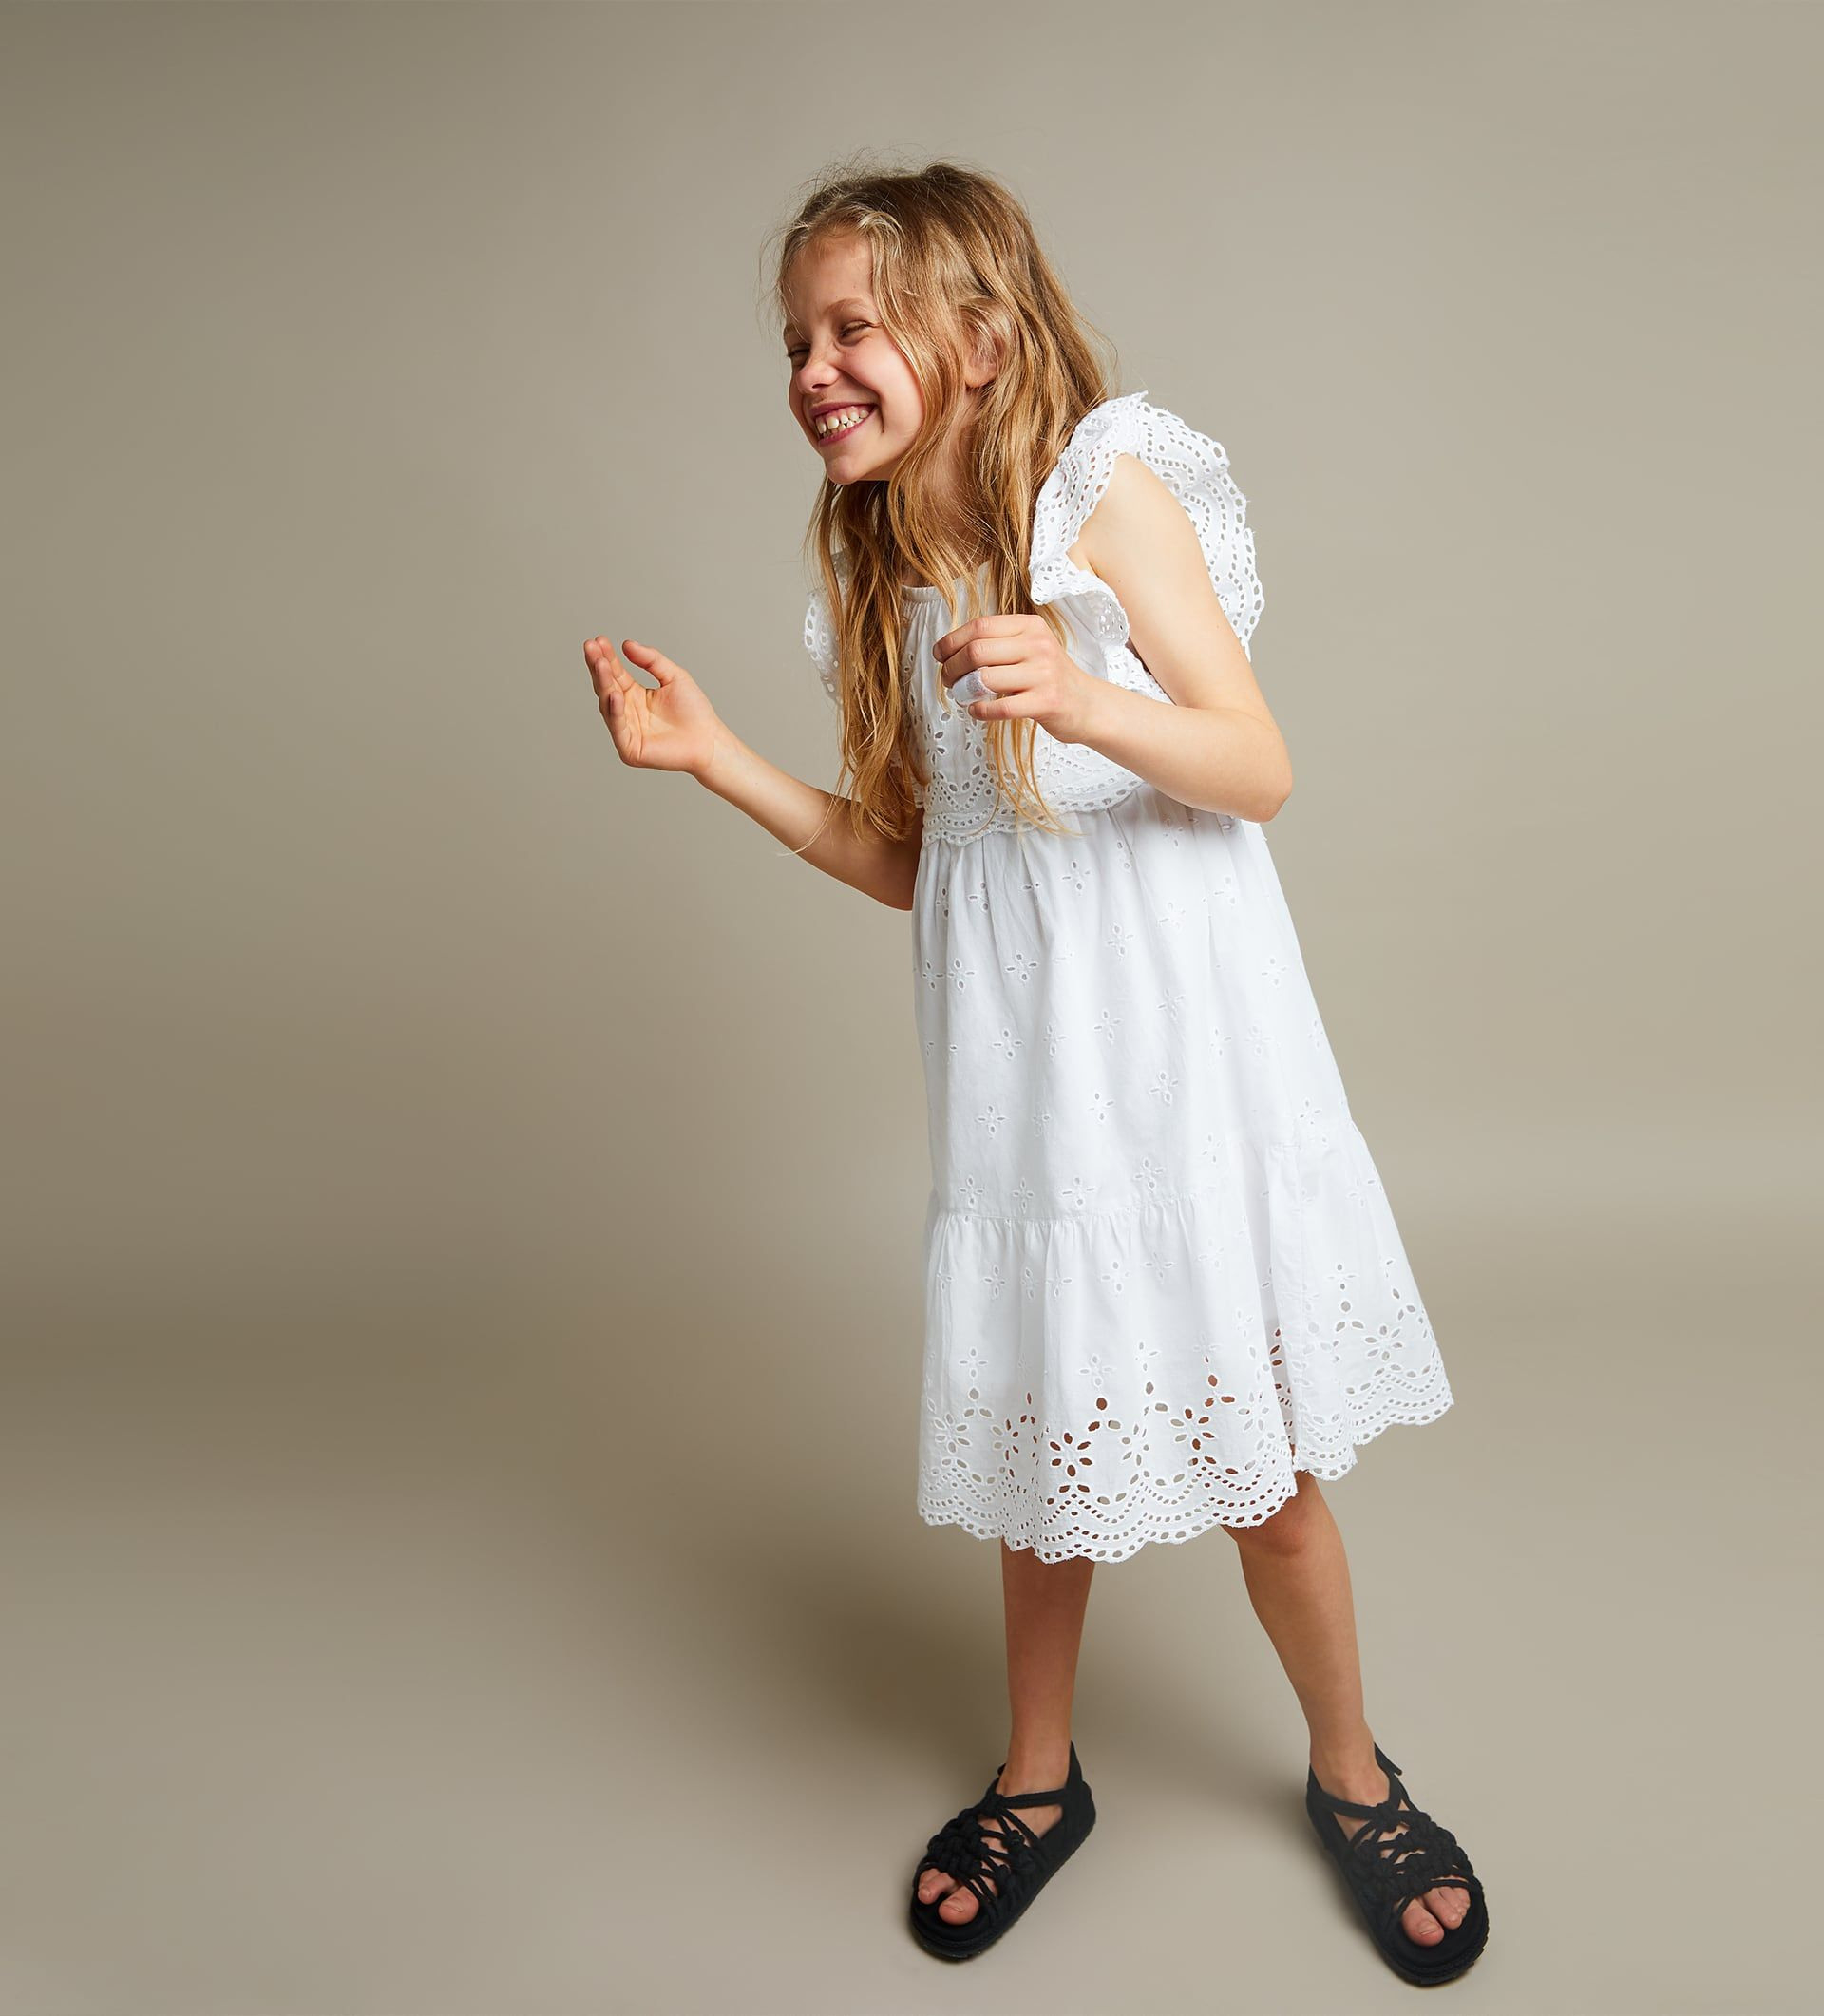 Zara  Kids  Swiss Embroidery Dress  Kleider Modestil